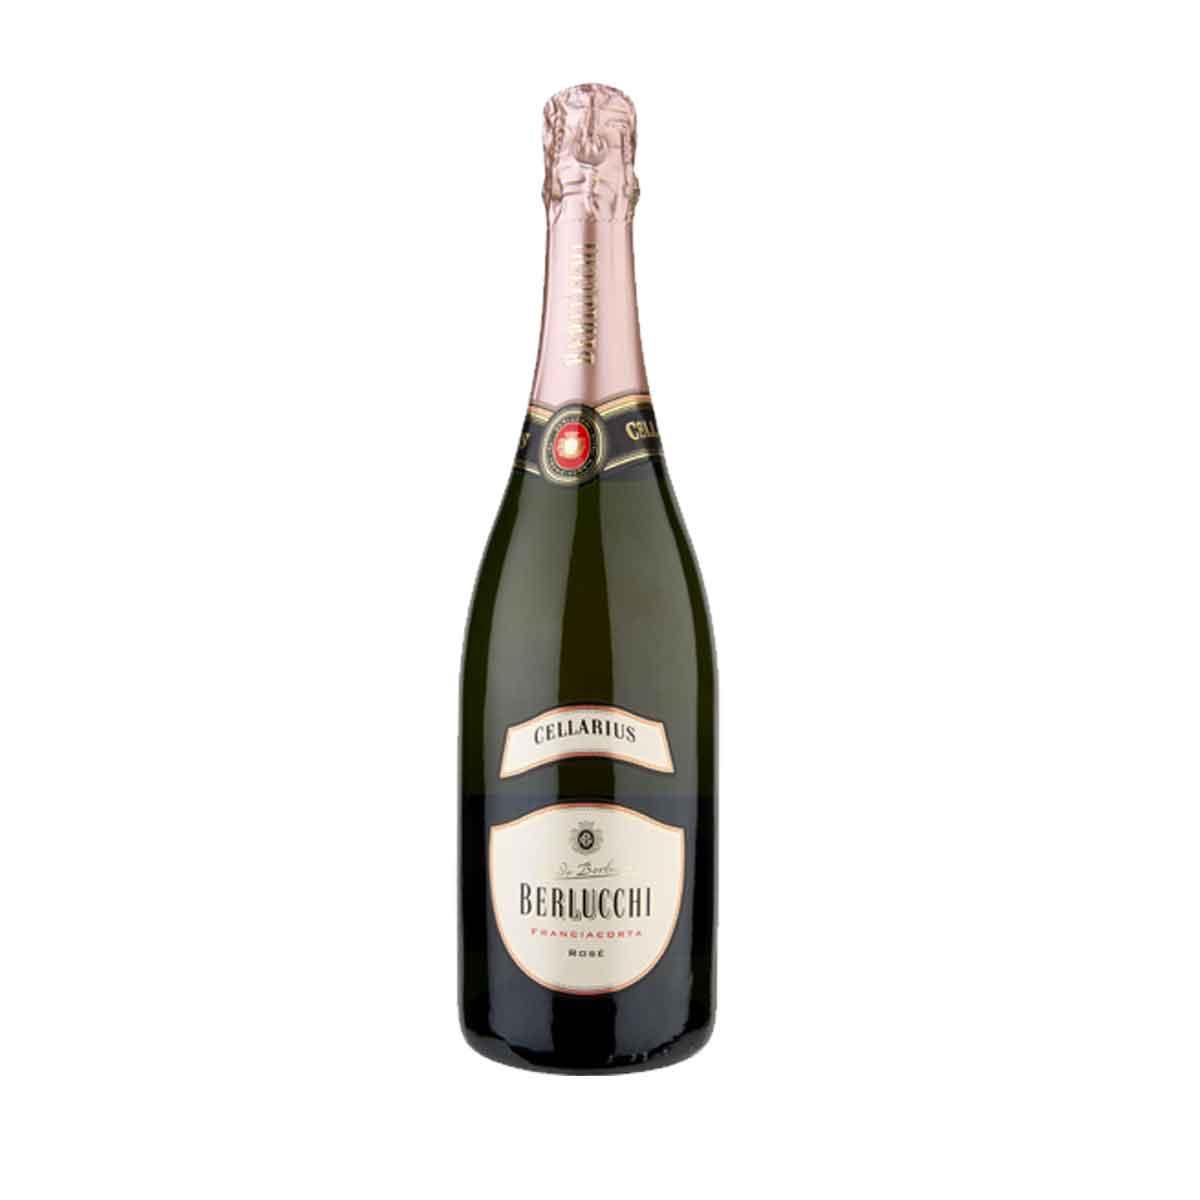 Franciacorta Rosè Brut Cellarius - Privilege Wine